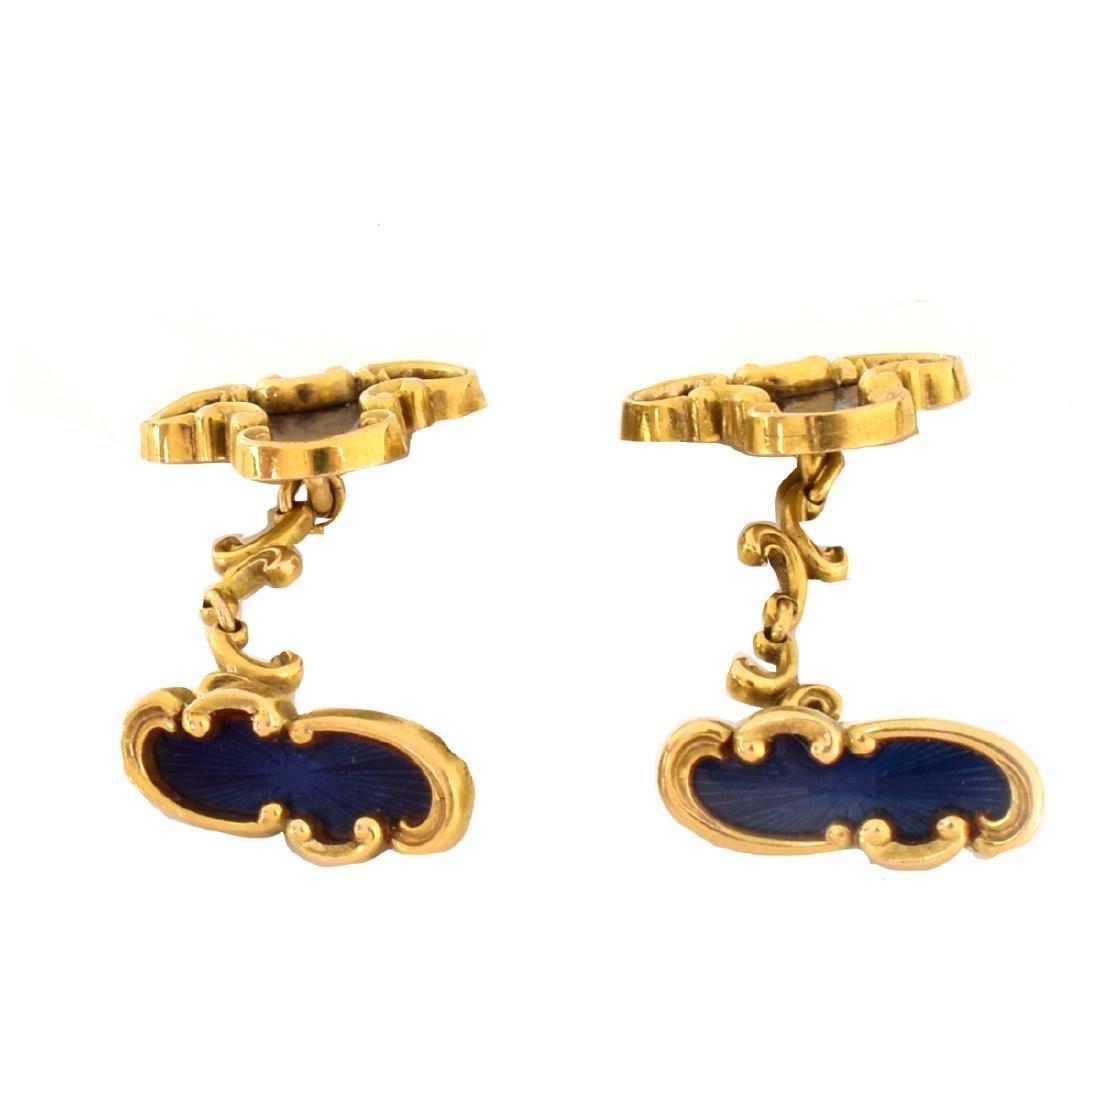 Russian Faberge Cufflinks - 3